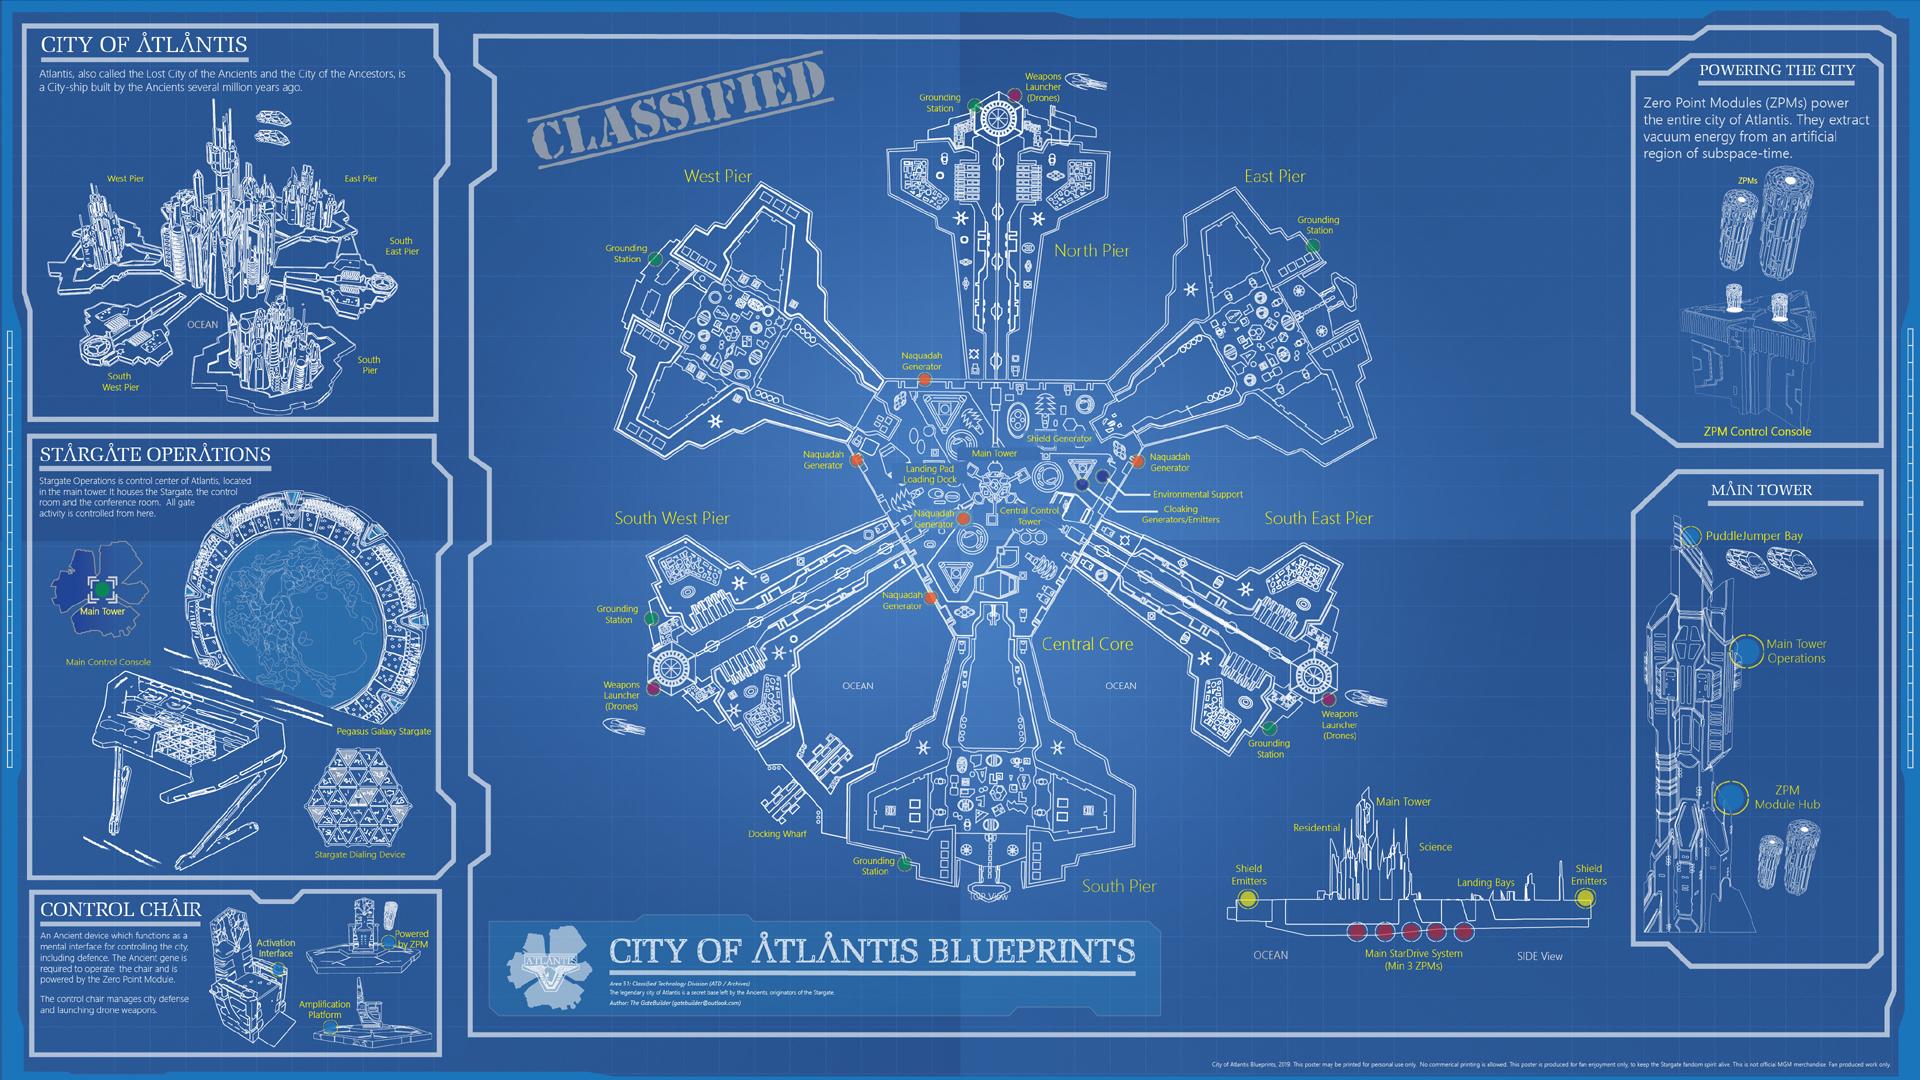 Stargate Atlantis: Download The City Blueprints » GateWorld